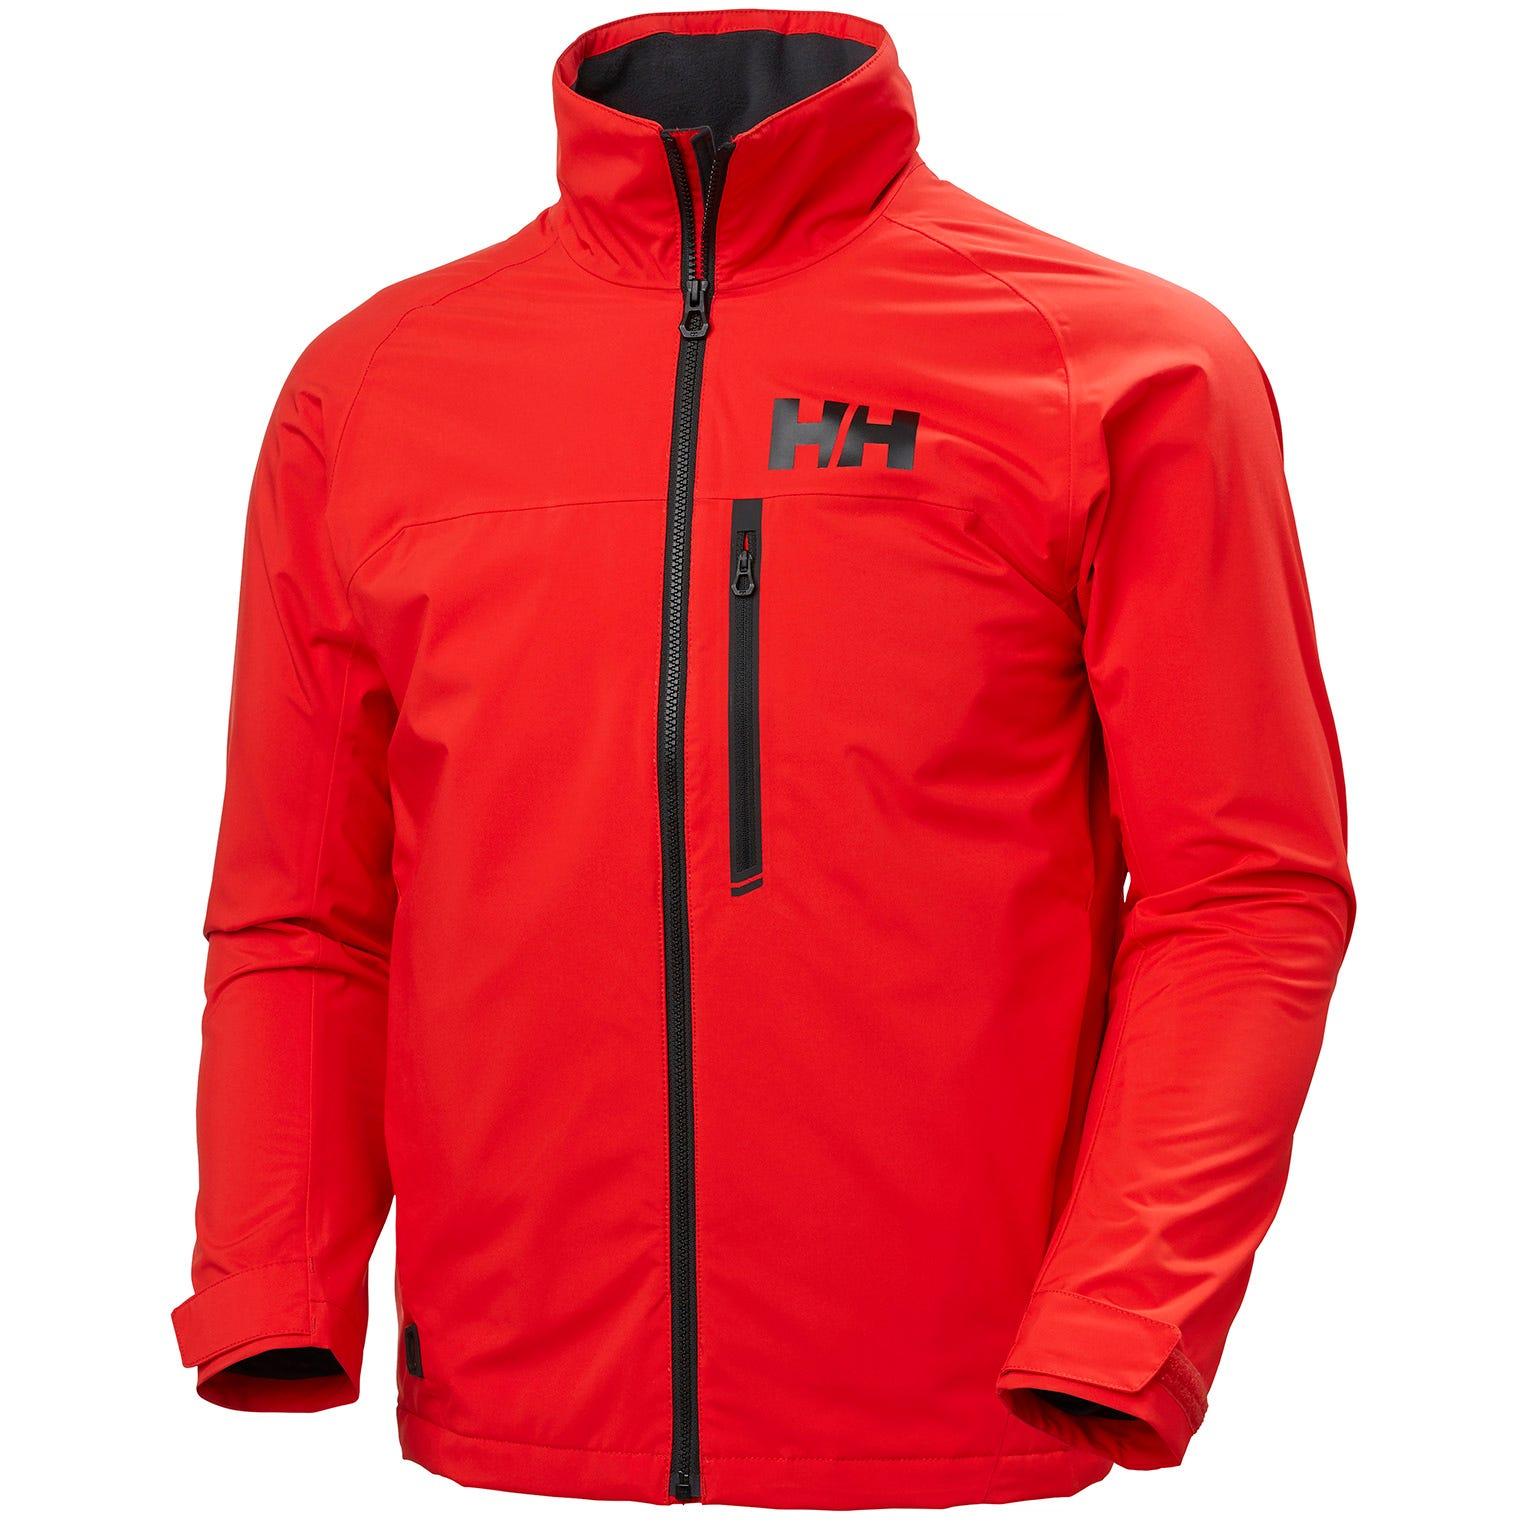 Helly Hansen Hp Racing Midlayer Jacket Mens Sailing Red M